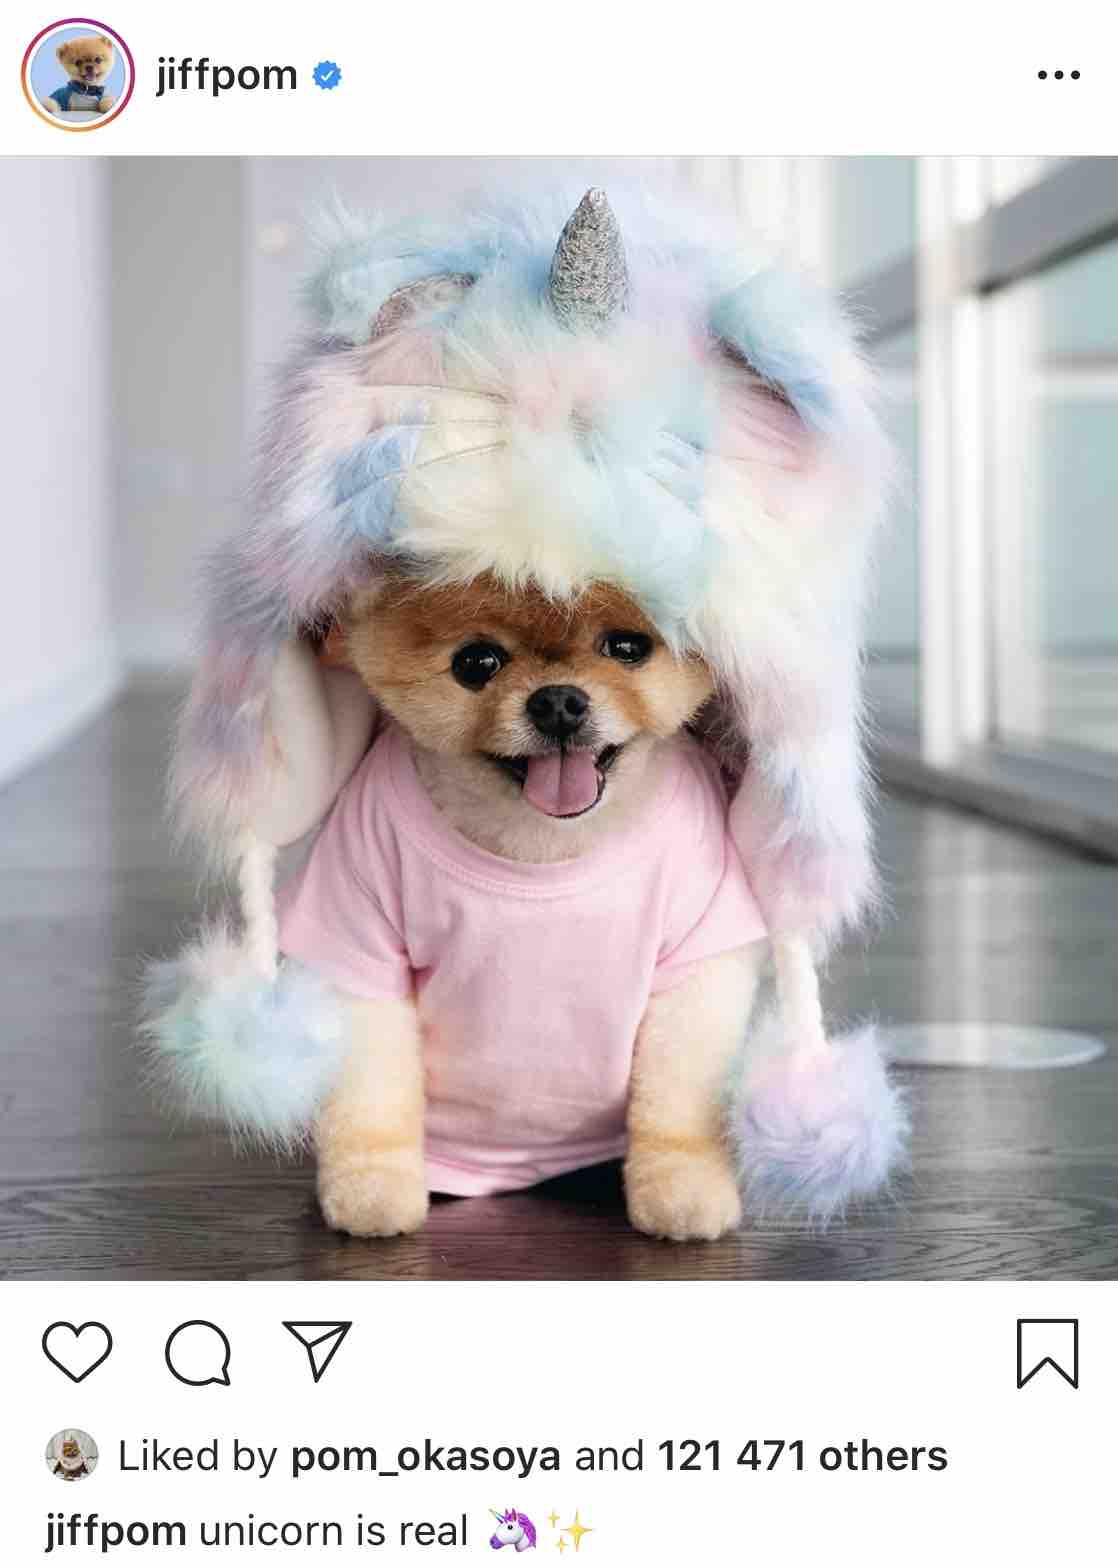 Jiffpom - Instagram